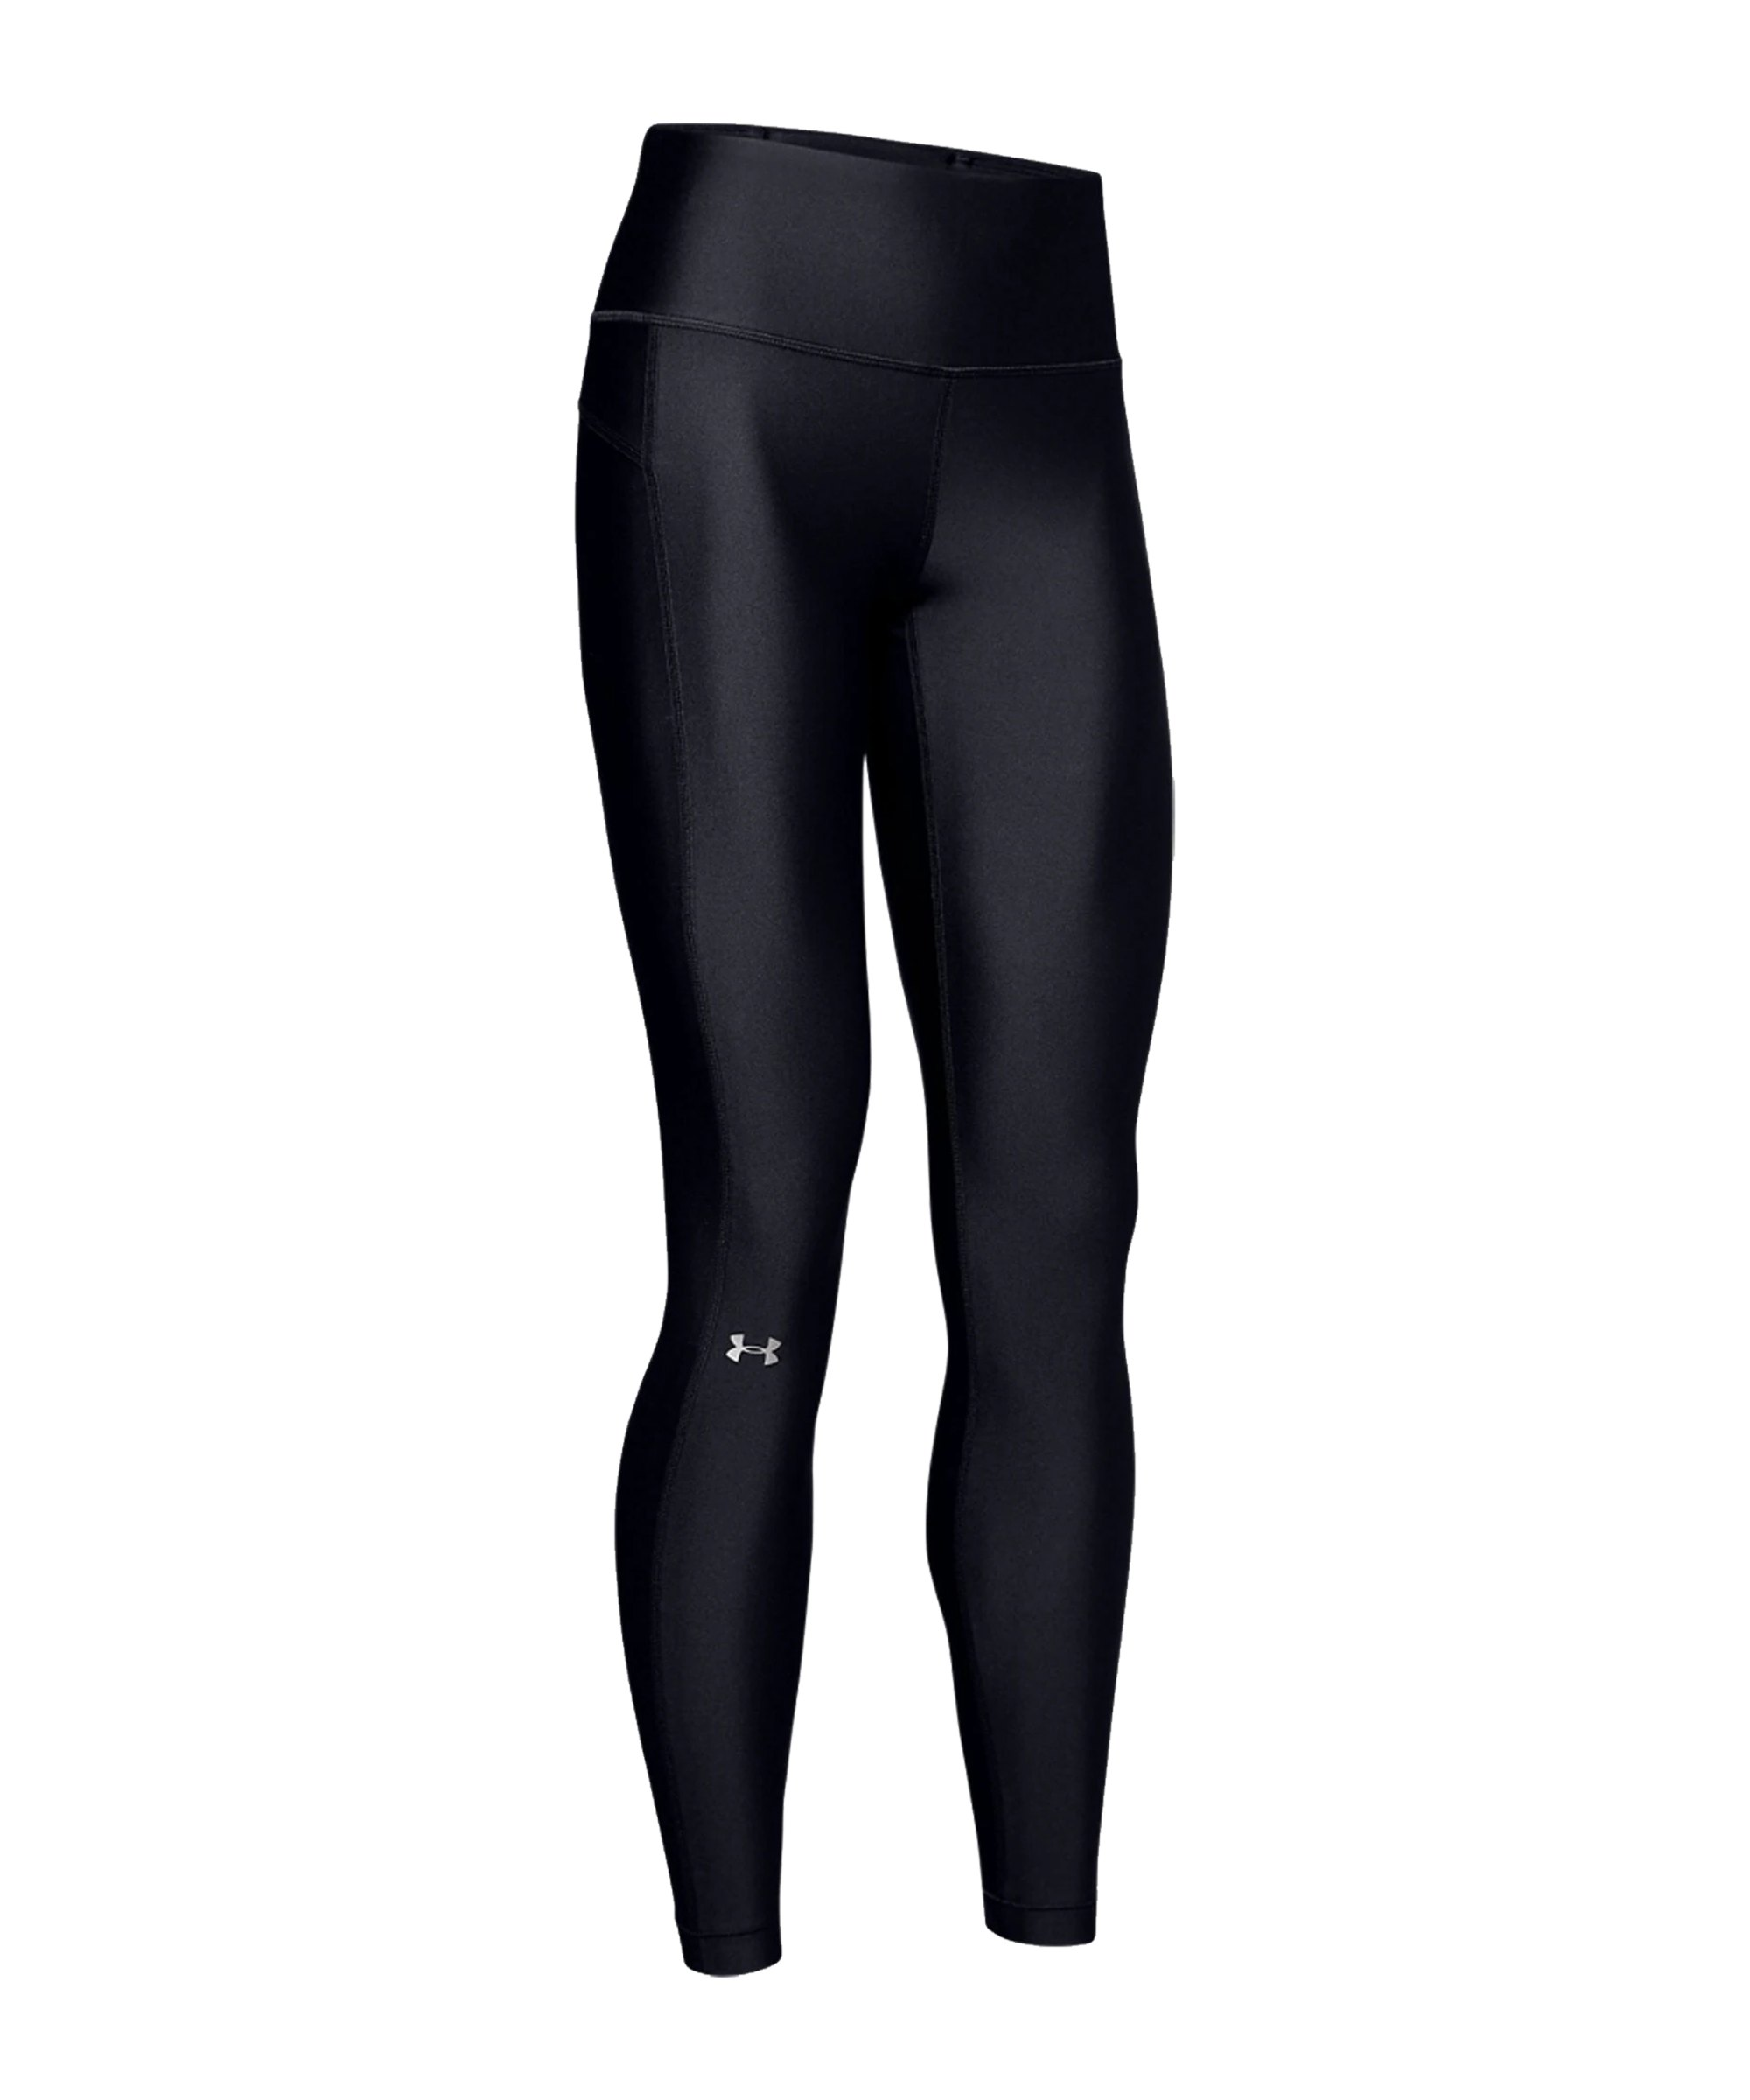 Under Armour HG Hi-Rise Leggings Damen F001 - schwarz